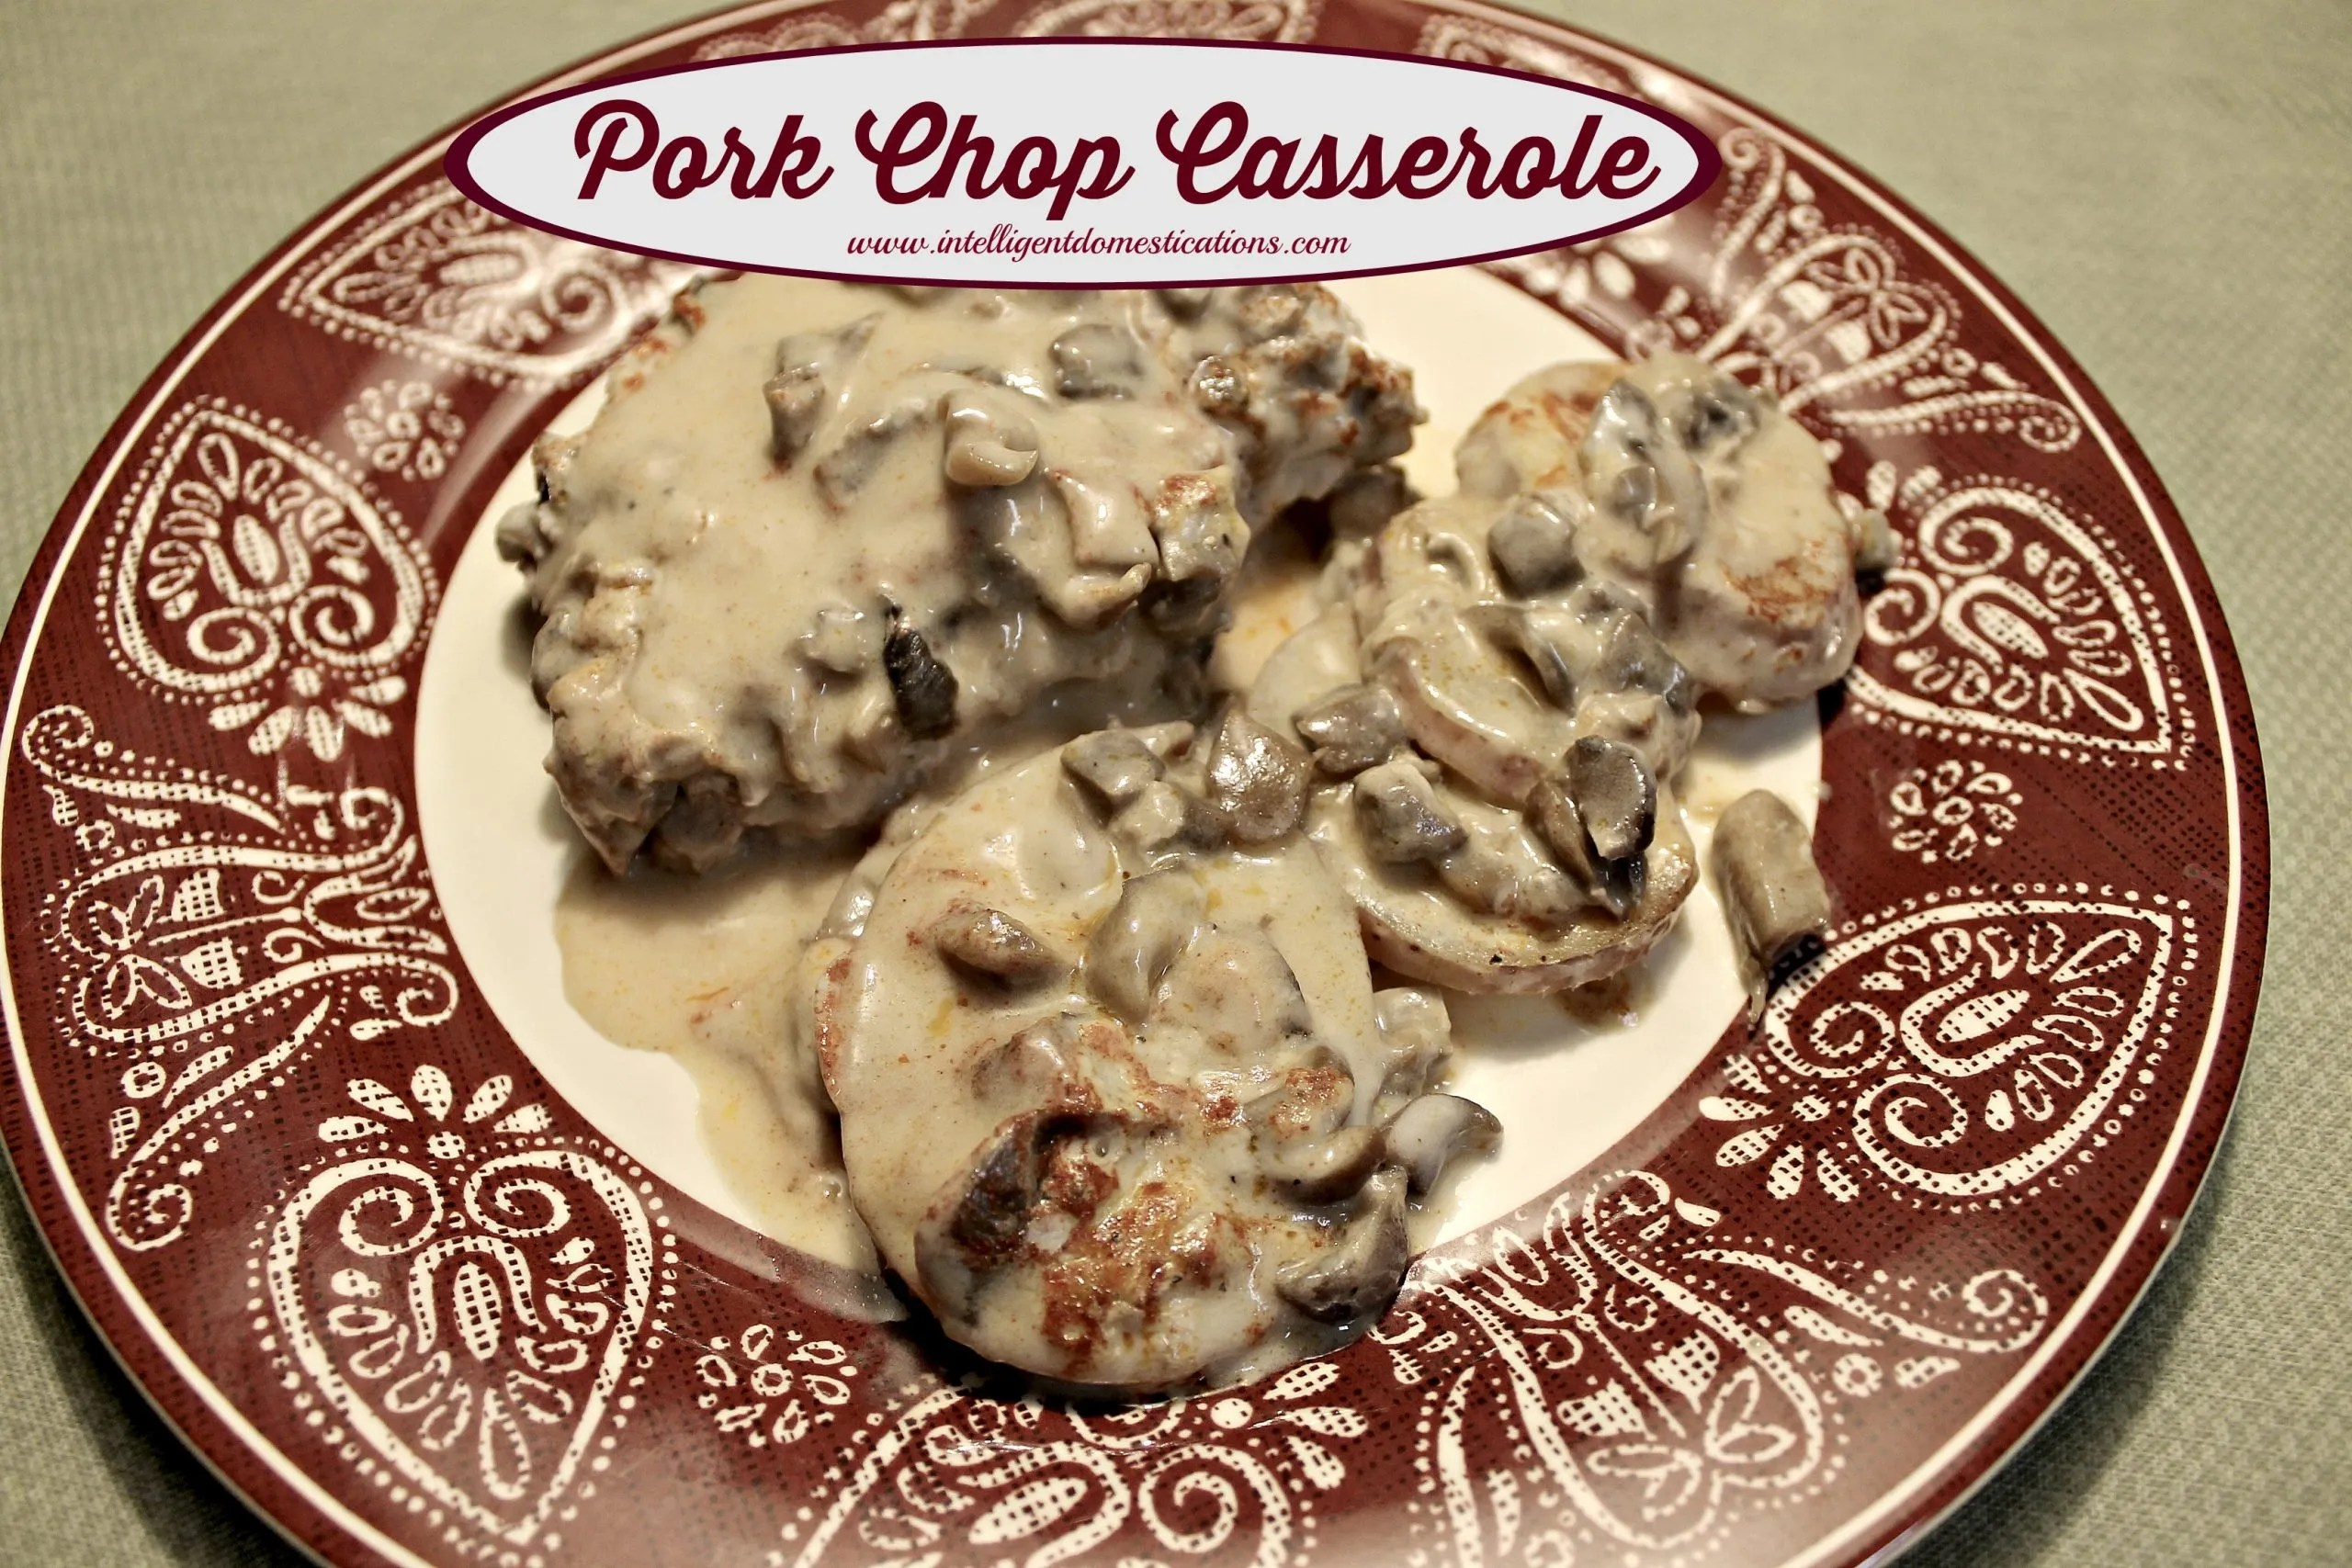 Momma's pork chop casserole served. Fine the recipe at www.intelligentdomestications.com